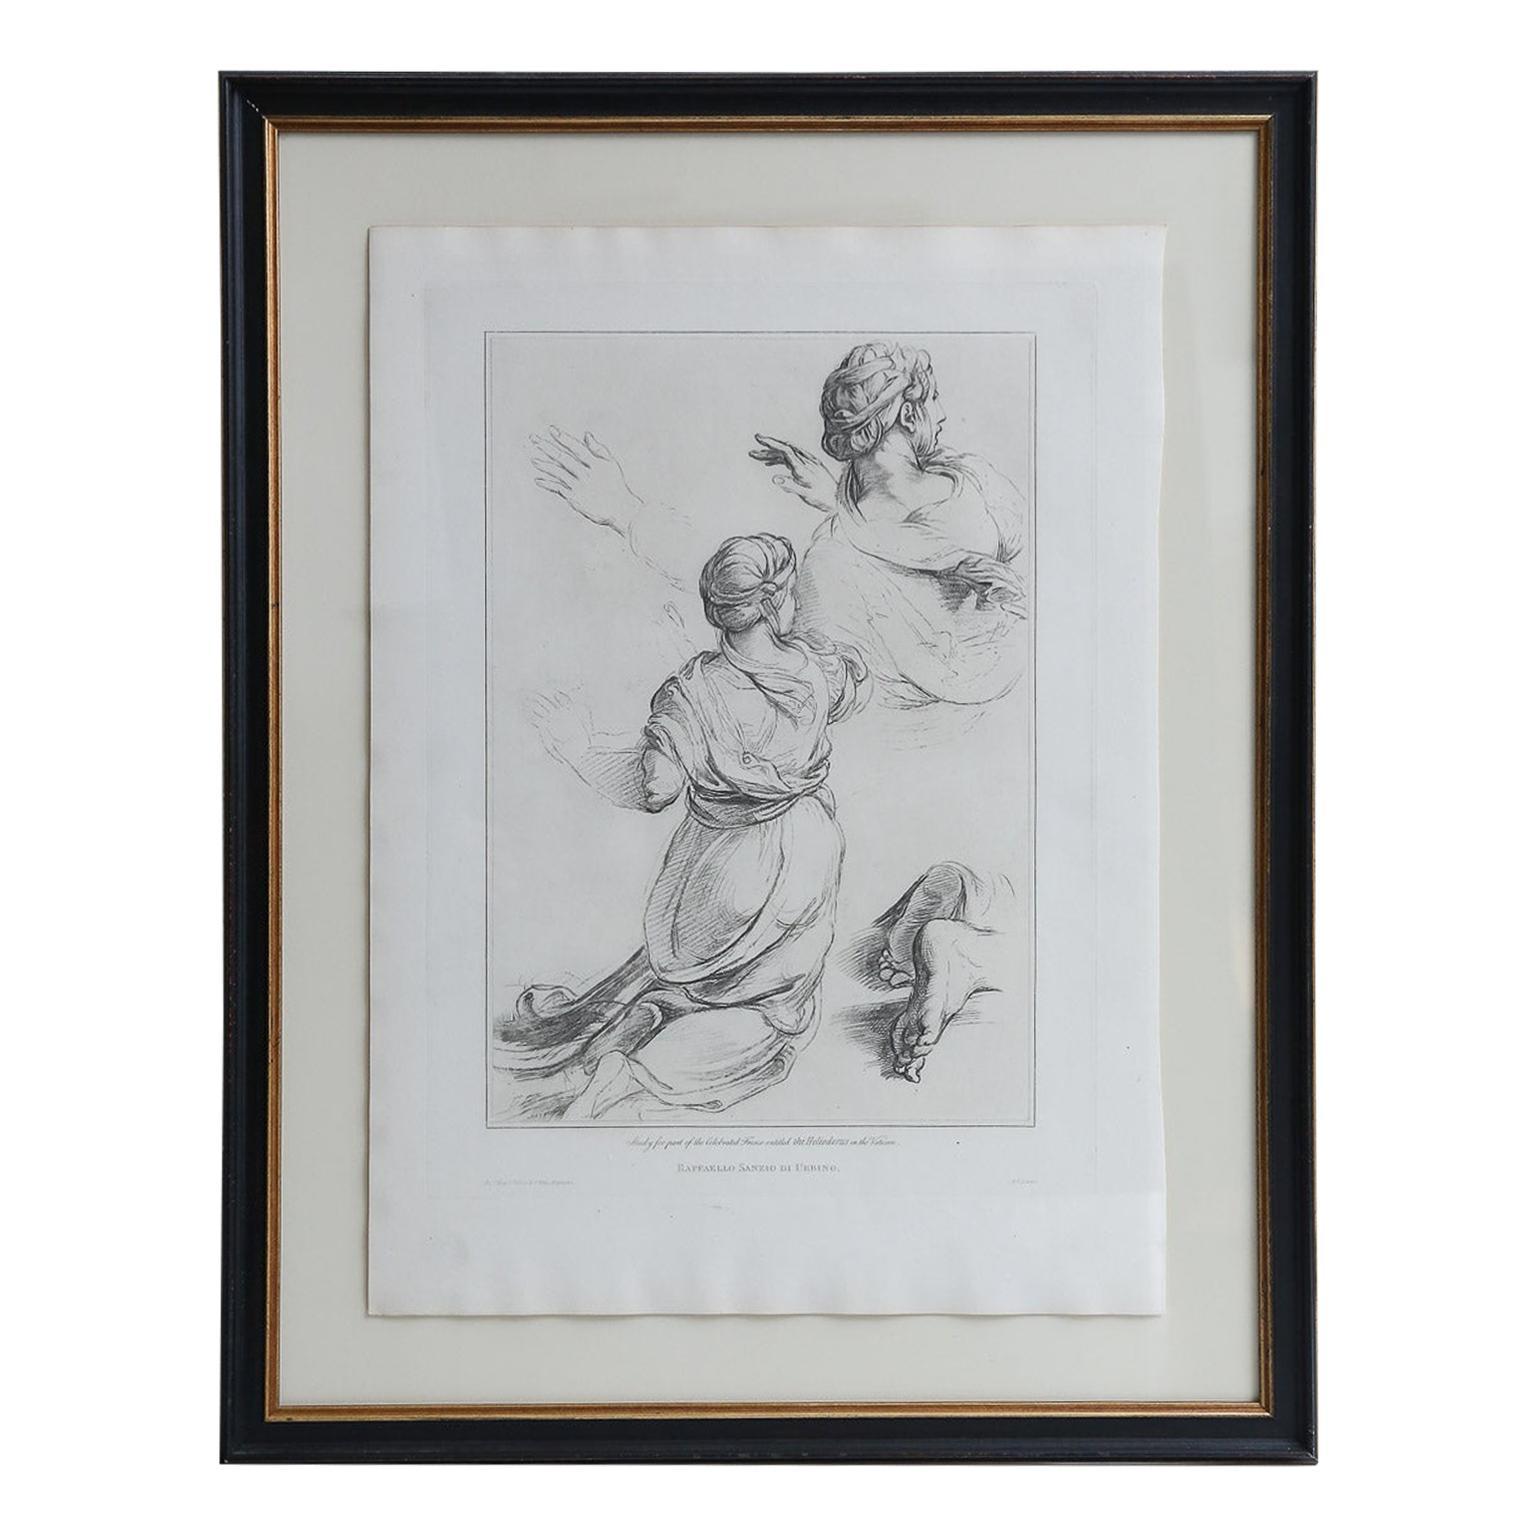 Series of Framed 19th Century Italian Engravings